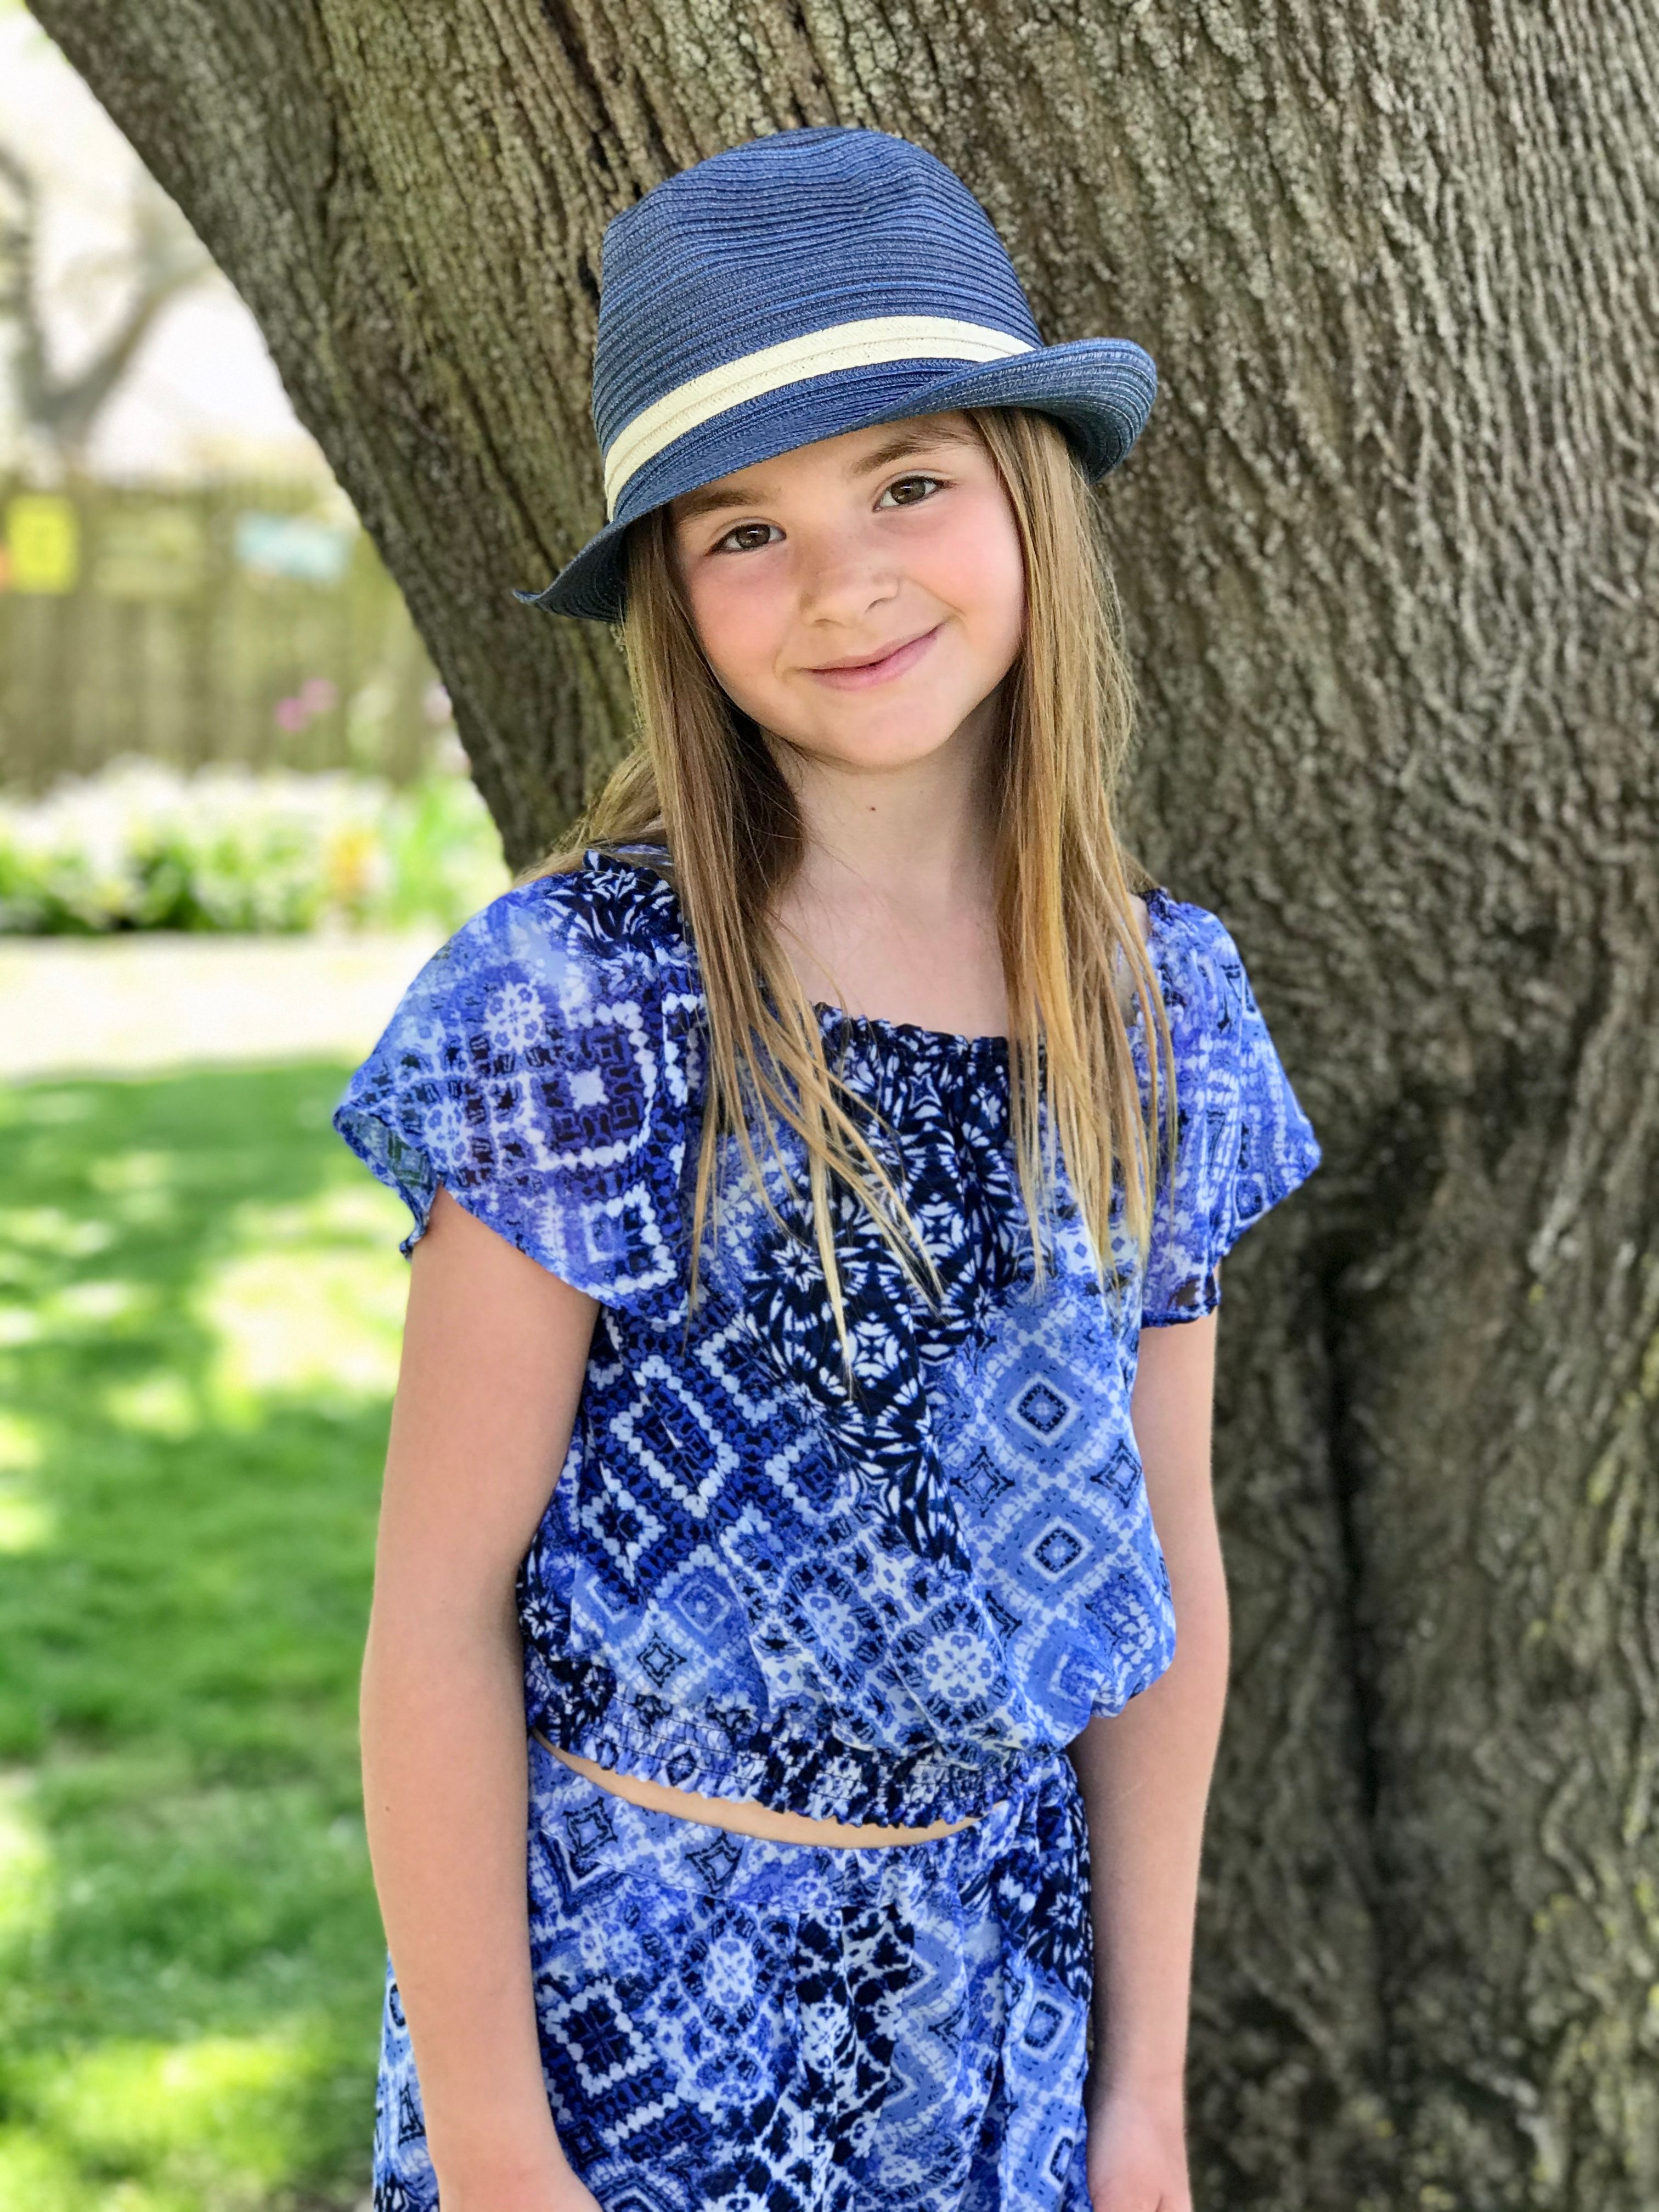 Lyla Zablotny, 8 Years